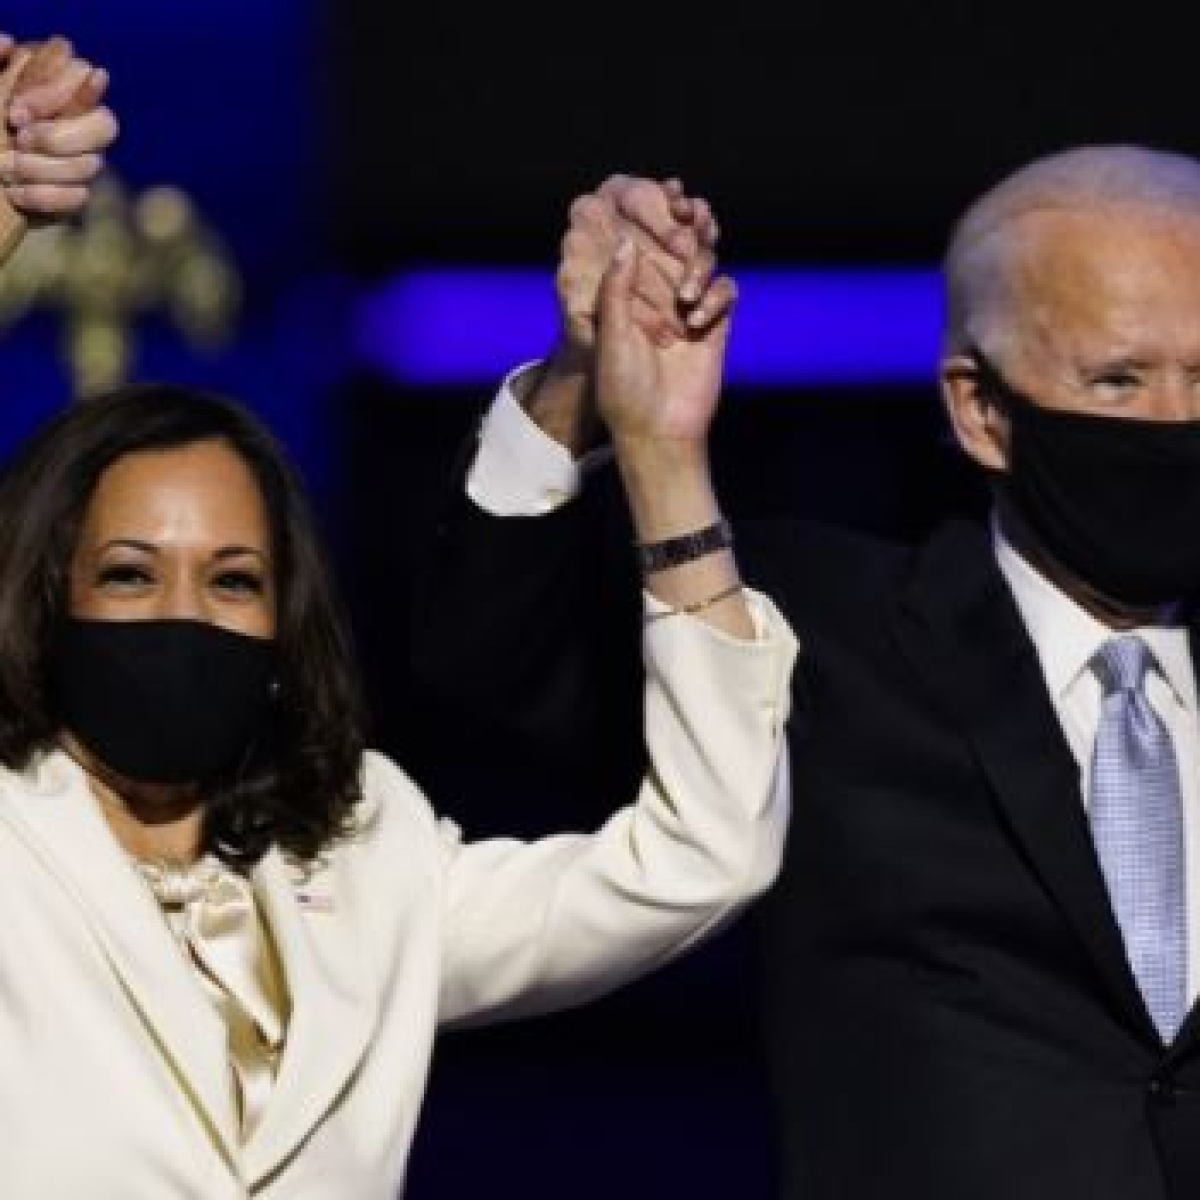 President Biden tasks Kamala Harris with leading diplomatic effort to stem immigrant flow